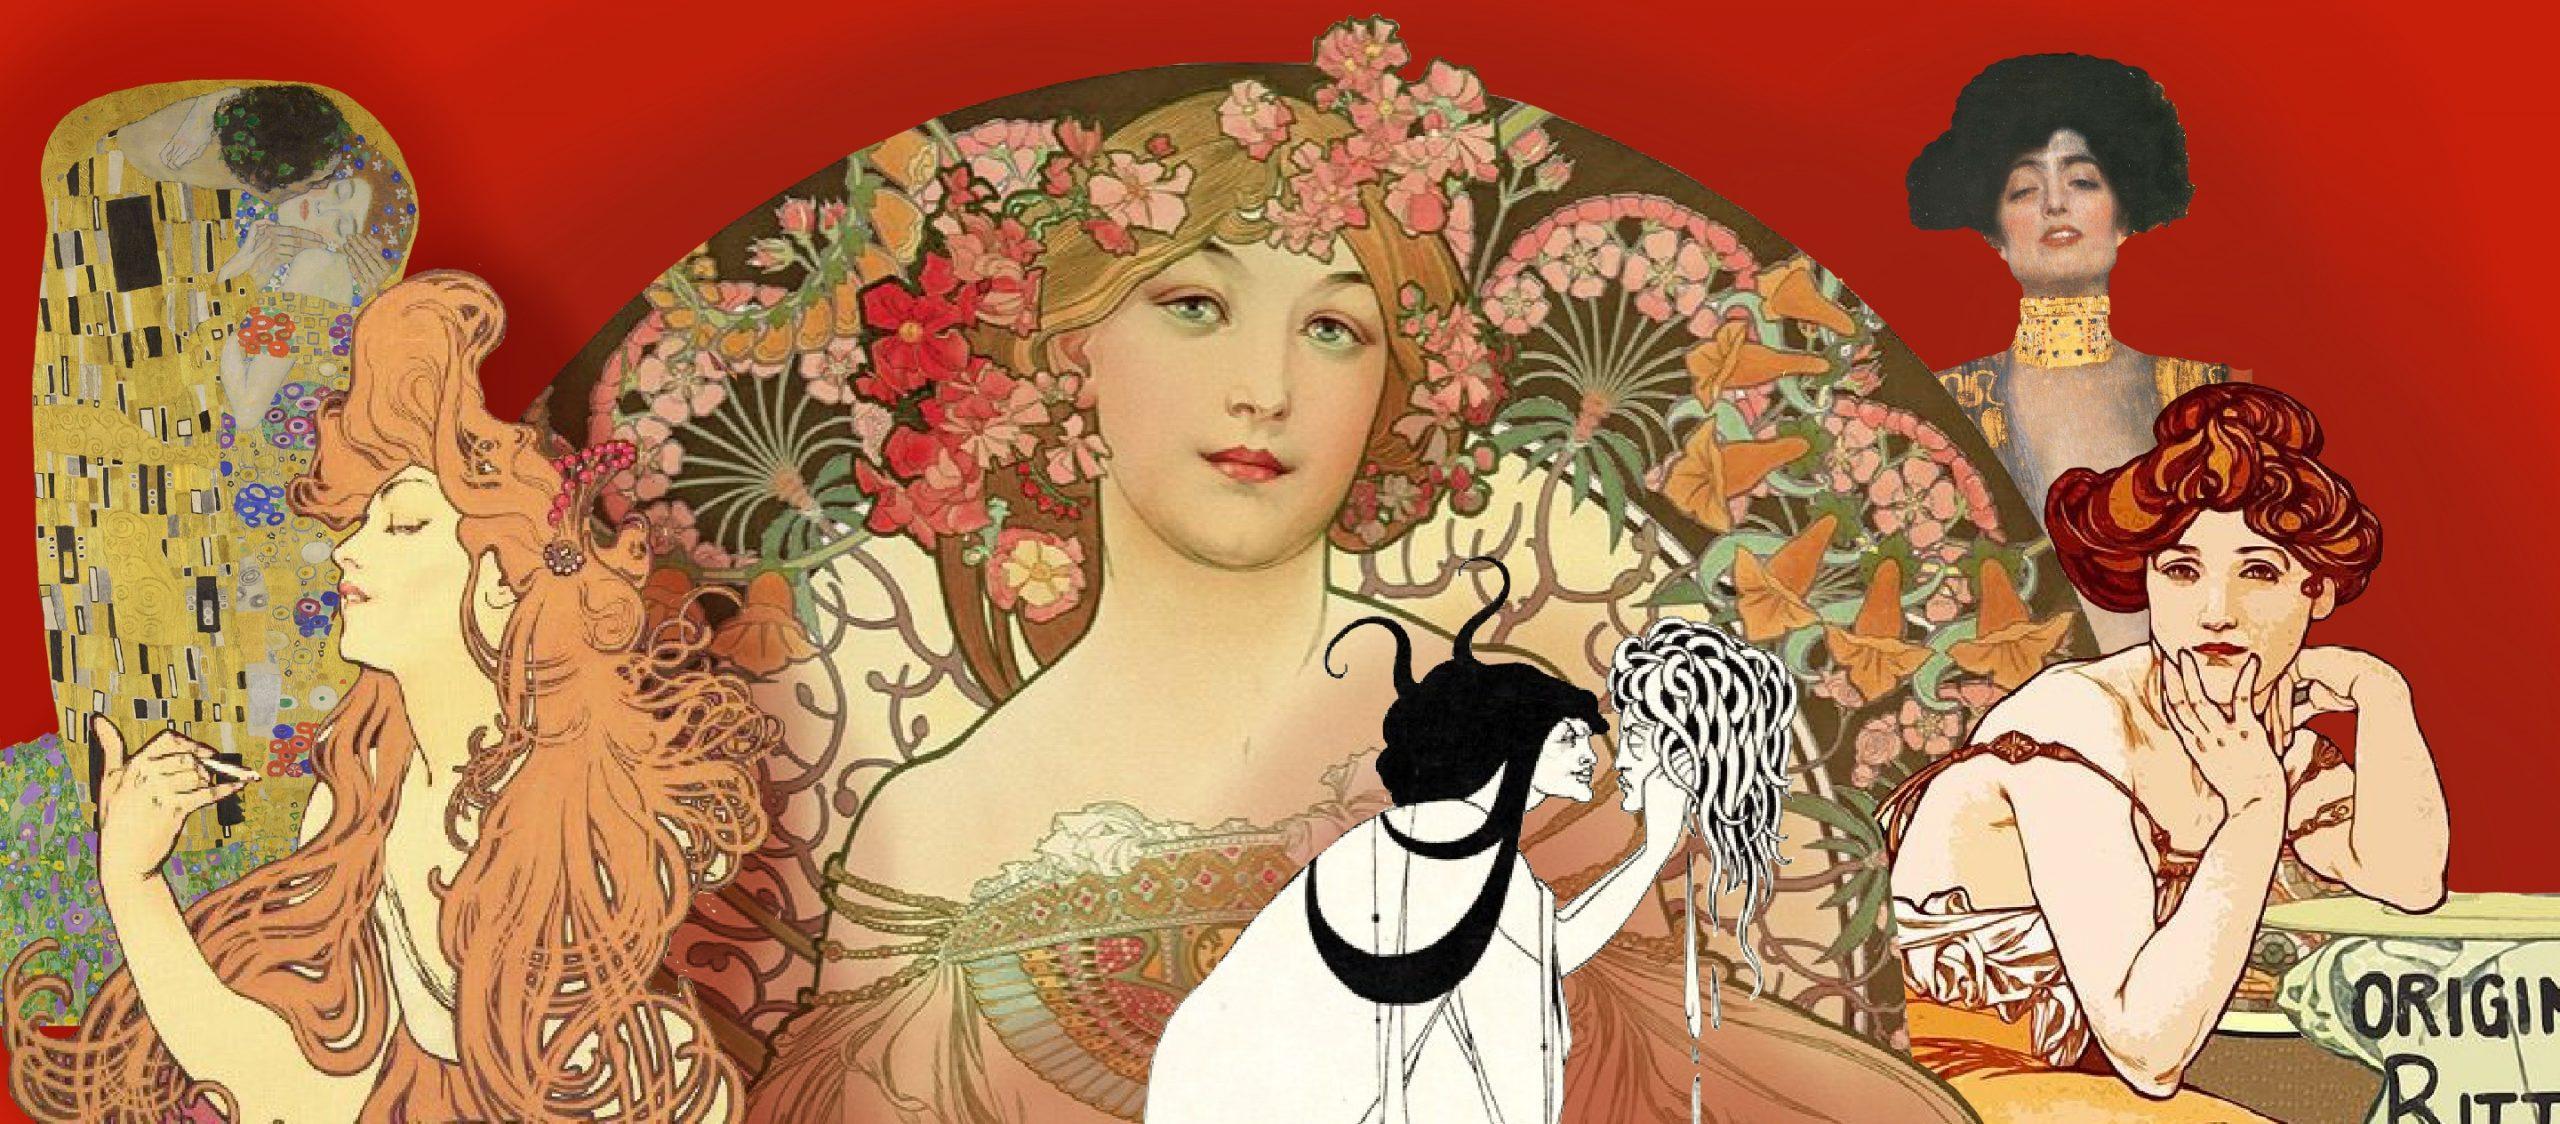 Something Nouveau ส่องมุมมองต่อ 'ผู้หญิงสมัยใหม่' ในศิลปะแบบอาร์ตนูโว